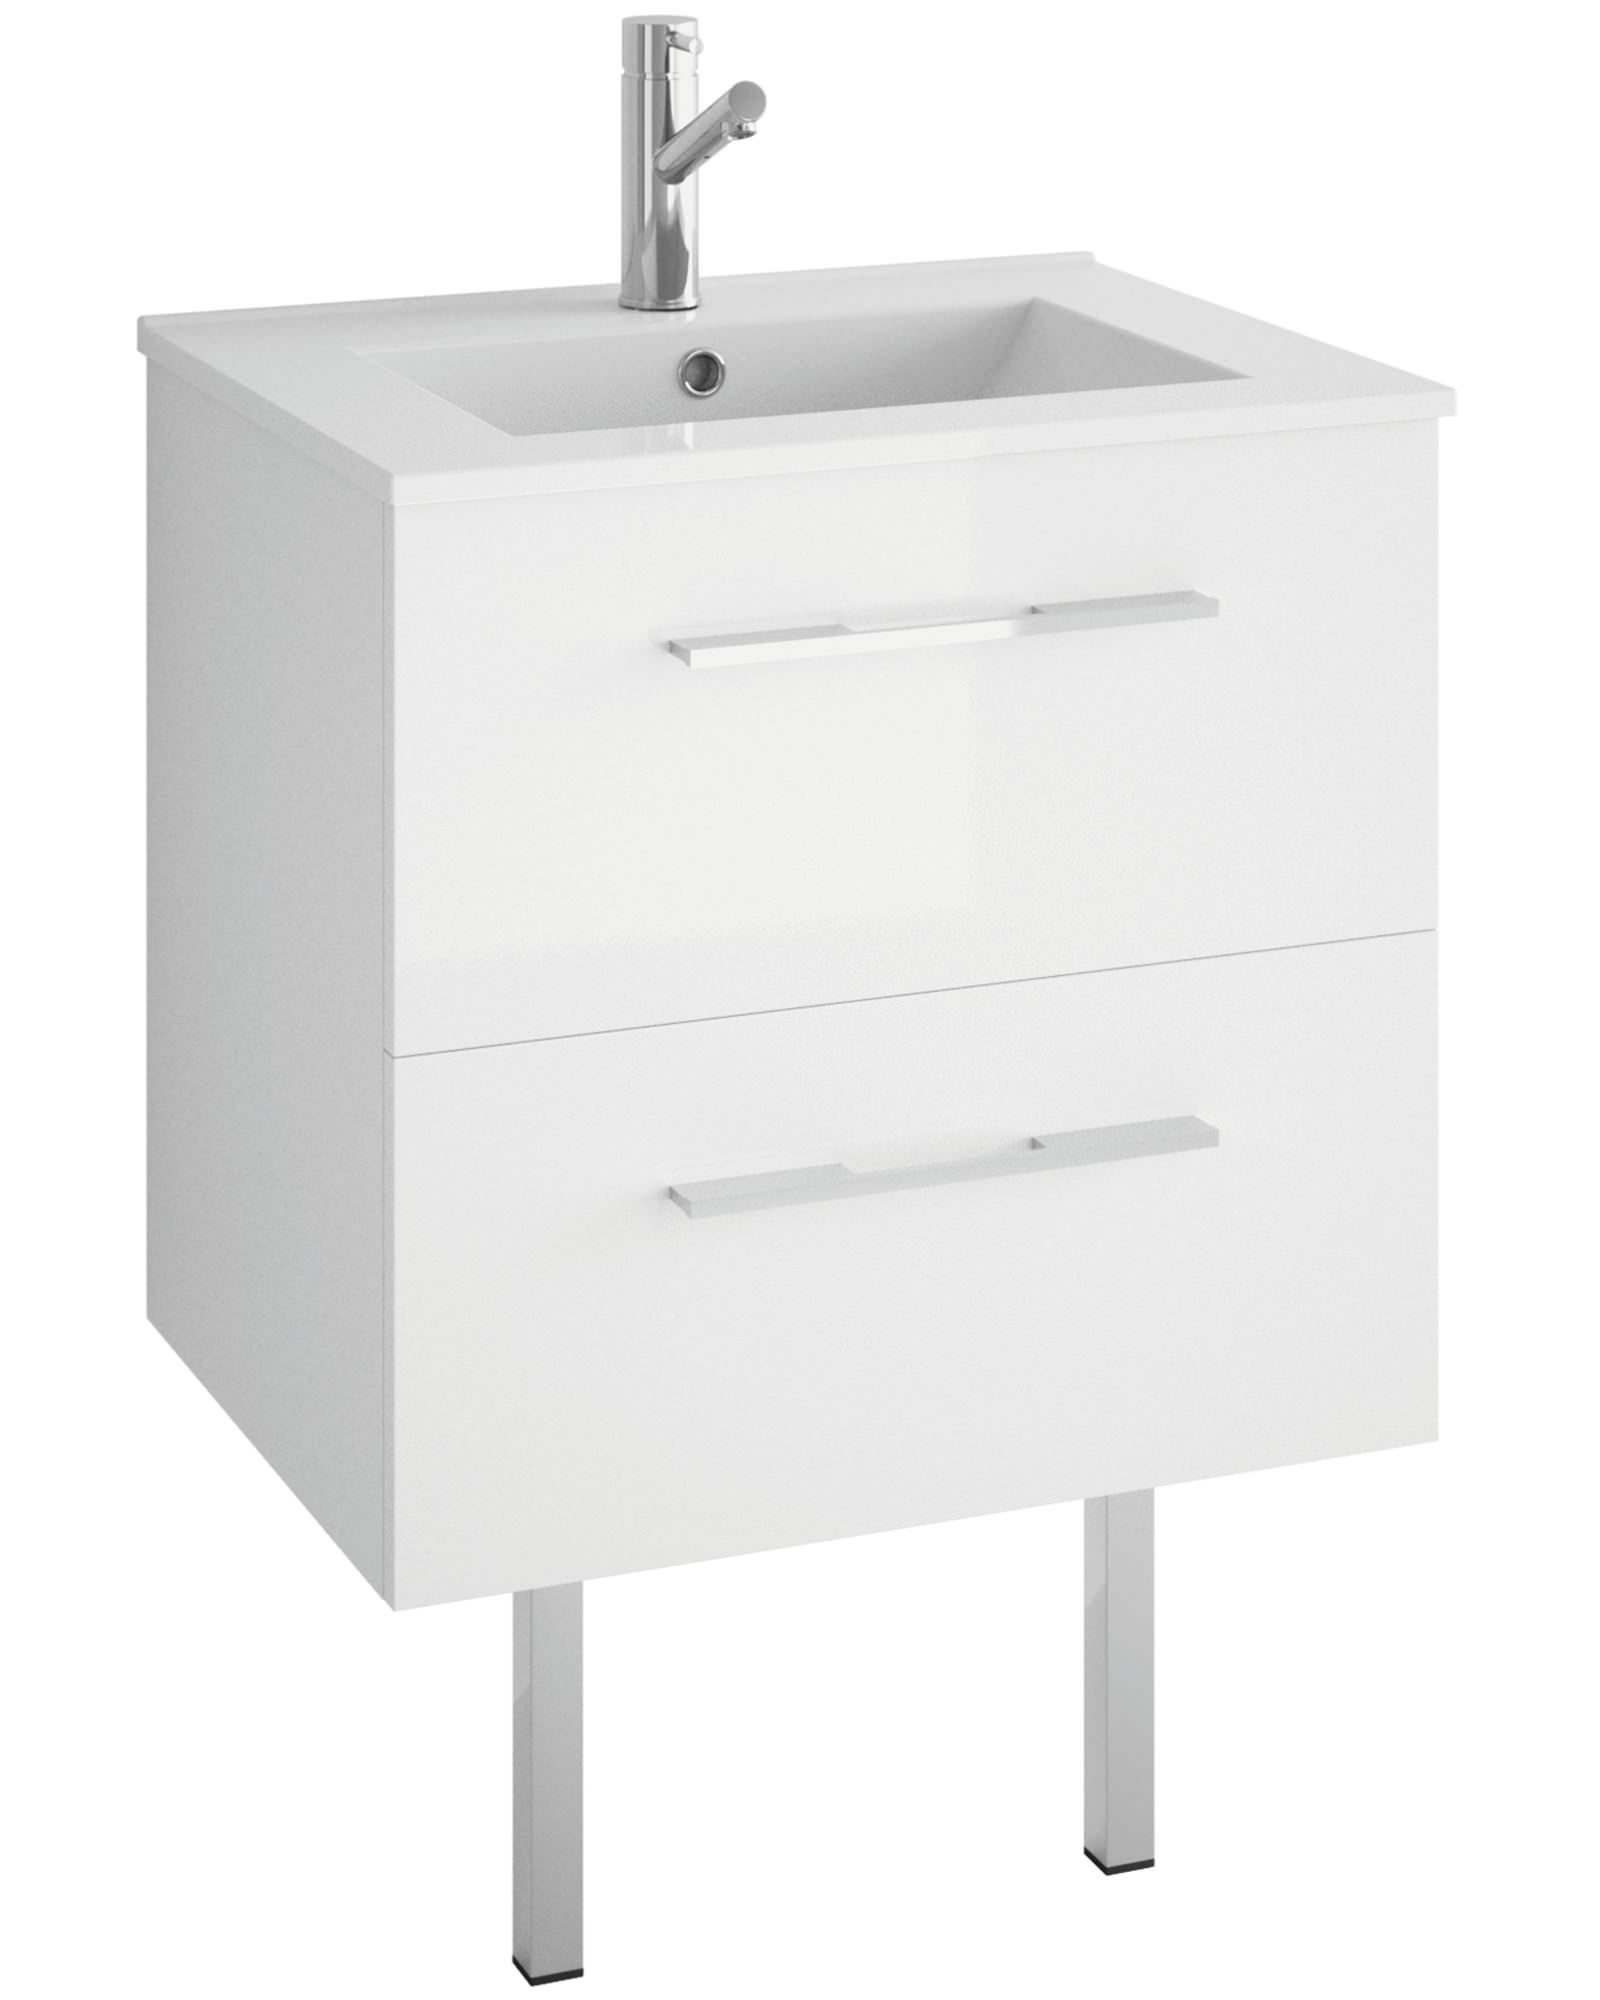 Mirrored bathroom vanity units - Croydex Chinnock 460mm Depth Vanity Unit With Basin